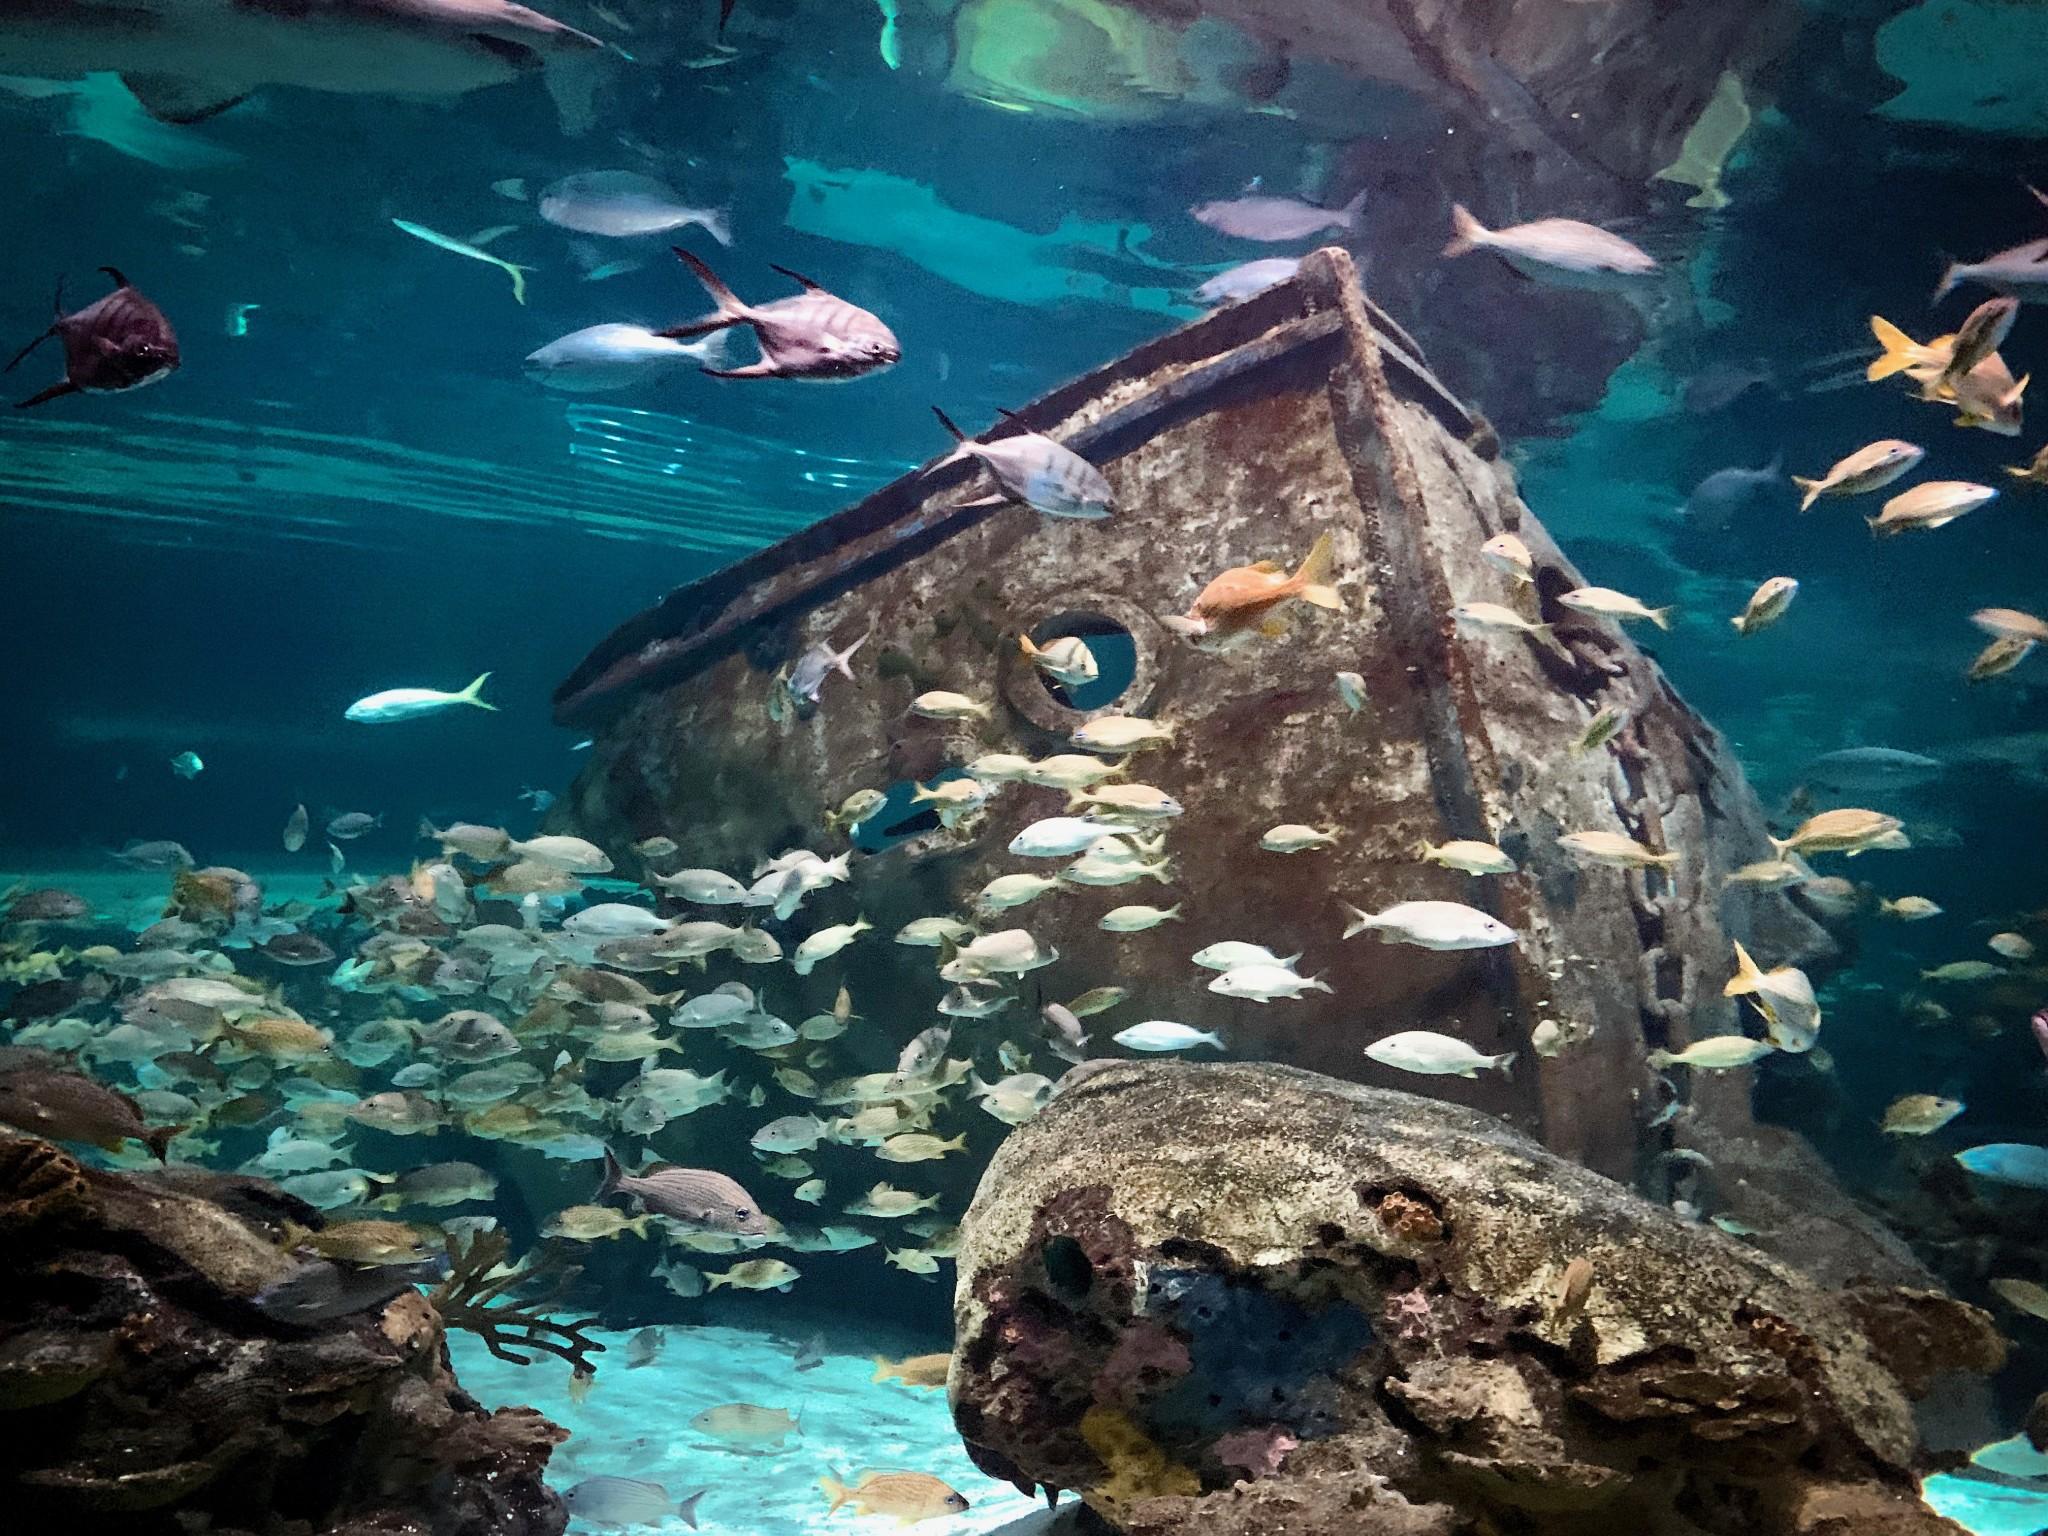 Gatlinburg Tn Hotels Near Ripley Aquarium - Aquarium Views